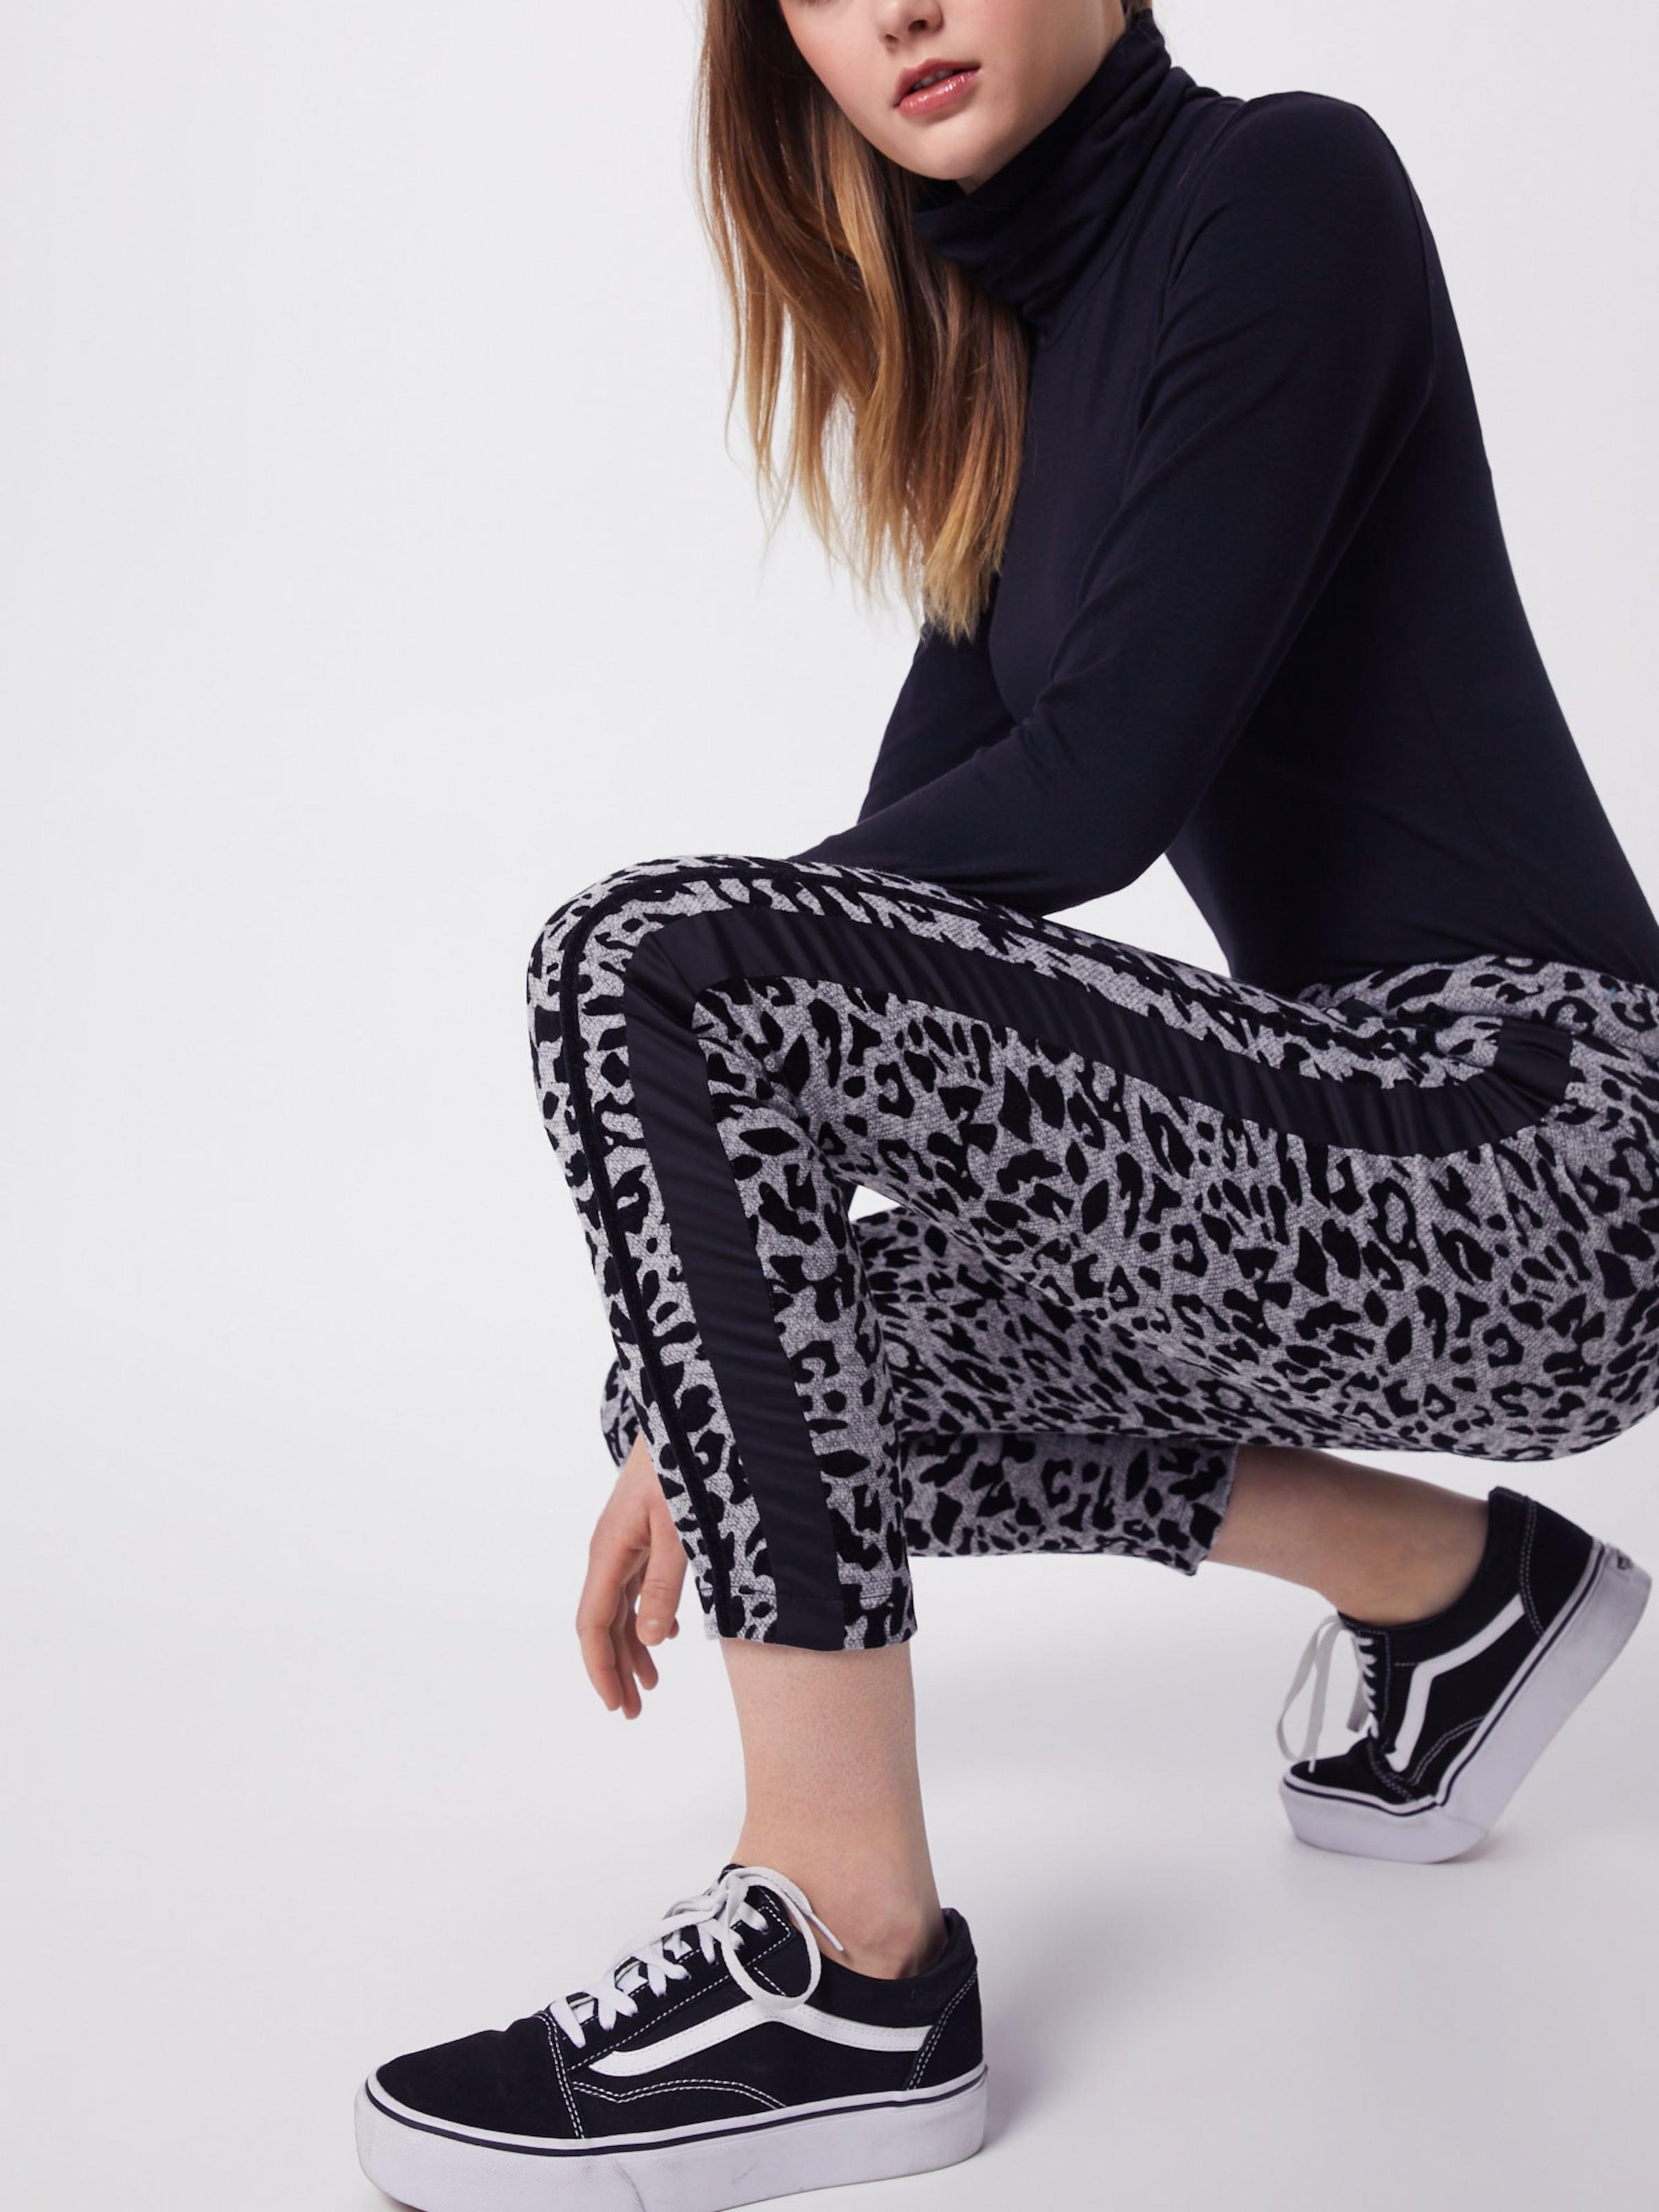 Pantalon Gang Flock Skinny' Print 'catyAnimalier Gris En Chiné dxBCeroW